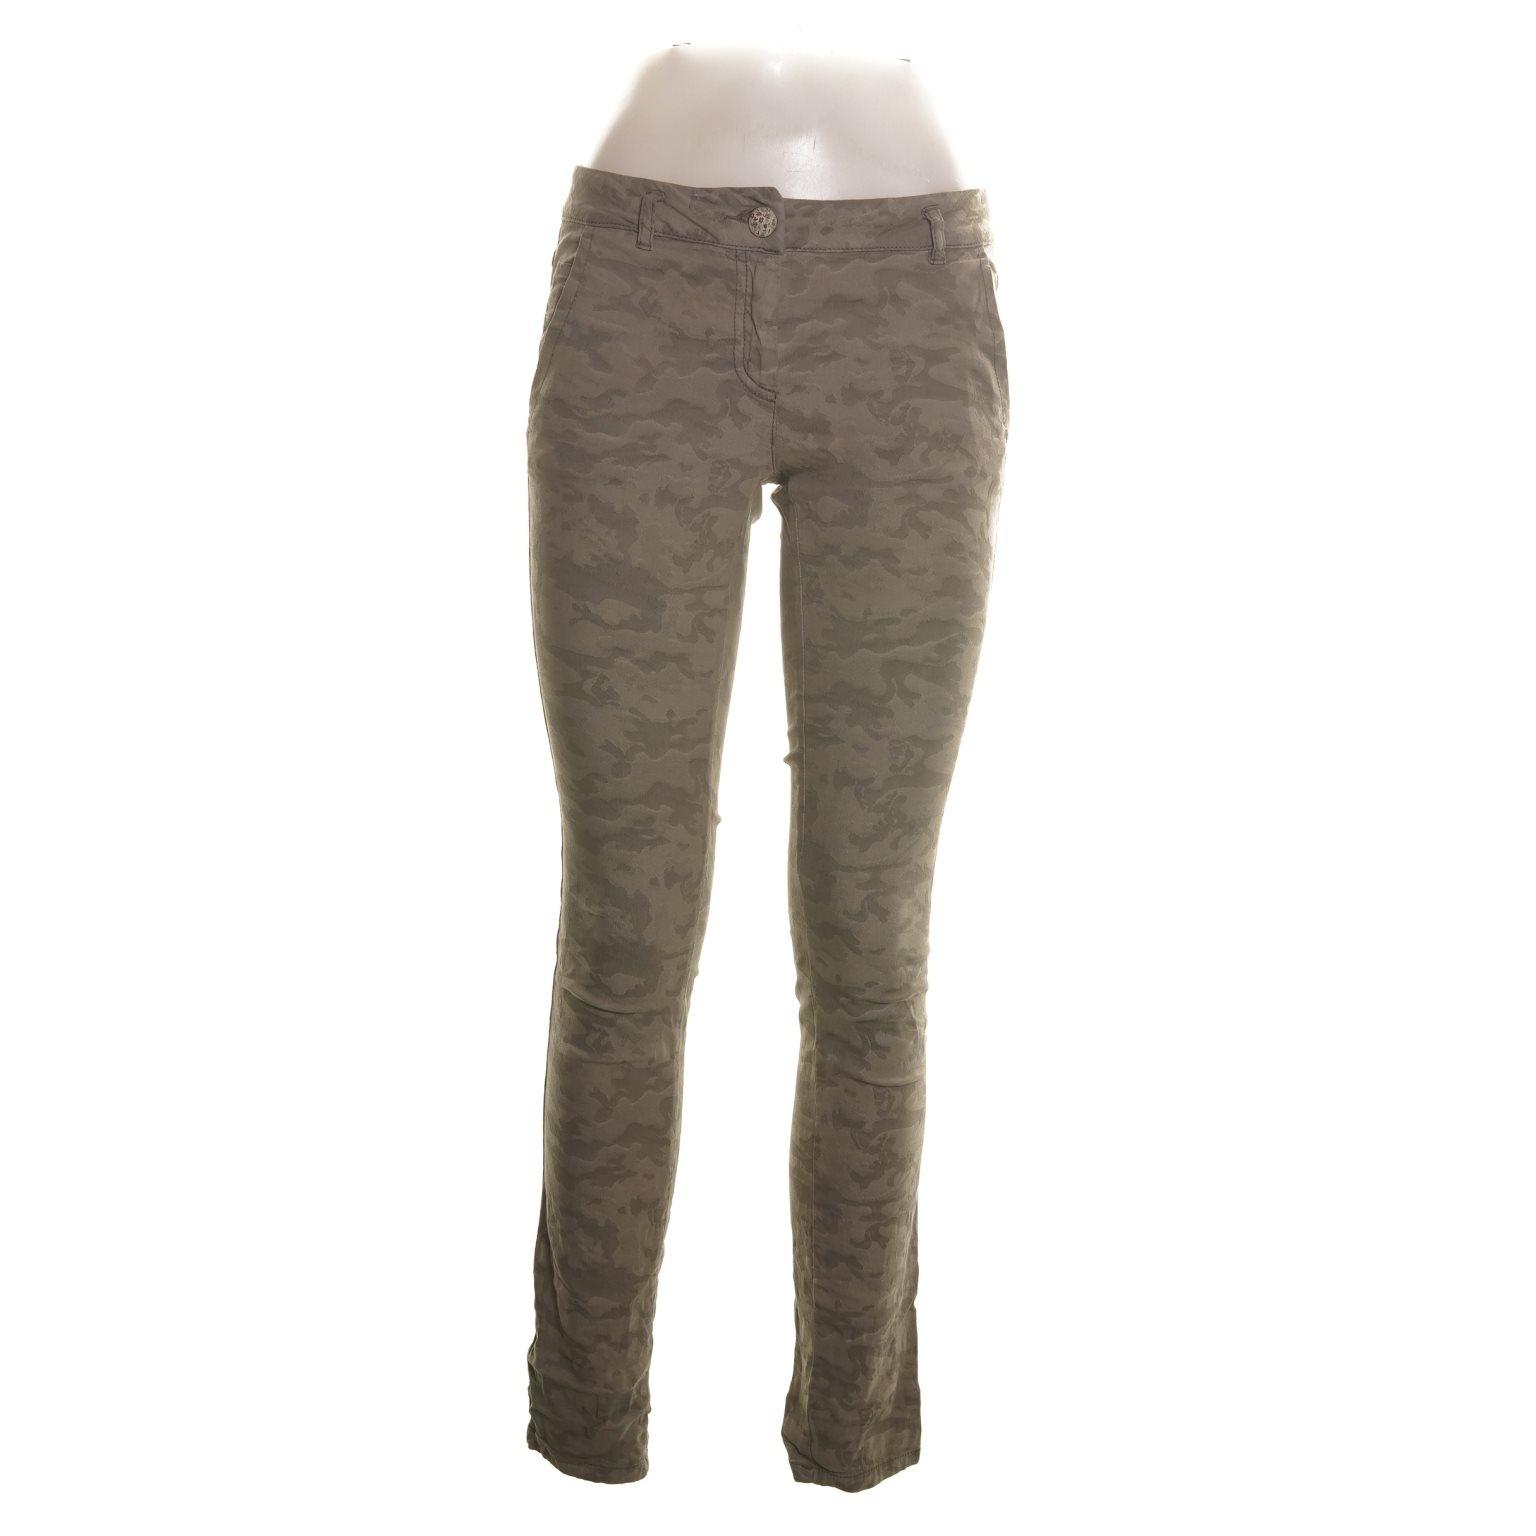 Marella Sport, Jeans, Strl: 34, Olivgrön